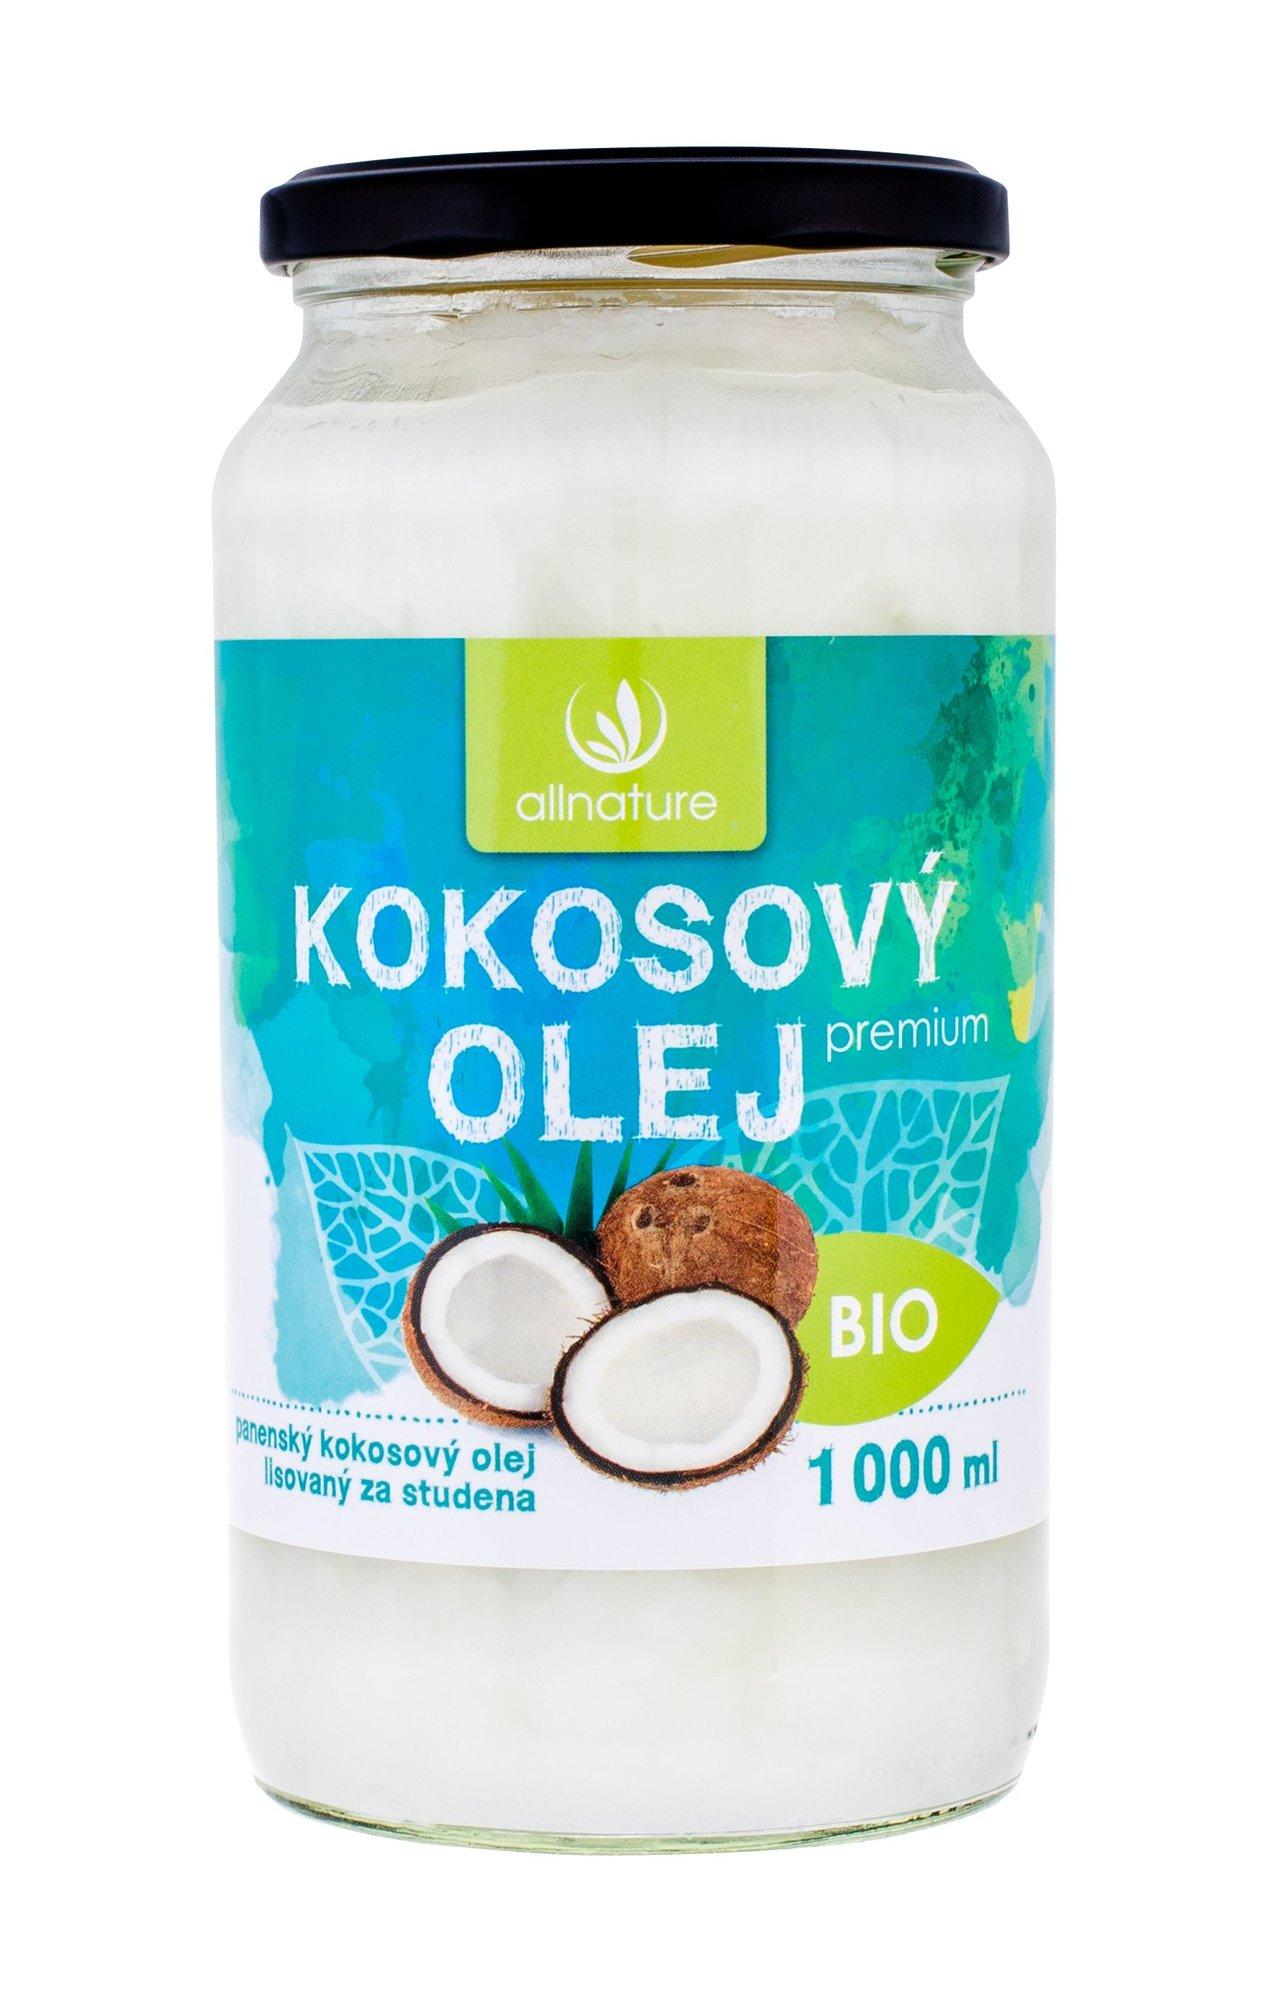 Allnature Premium Bio Coconut Oil Cosmetic 1000ml